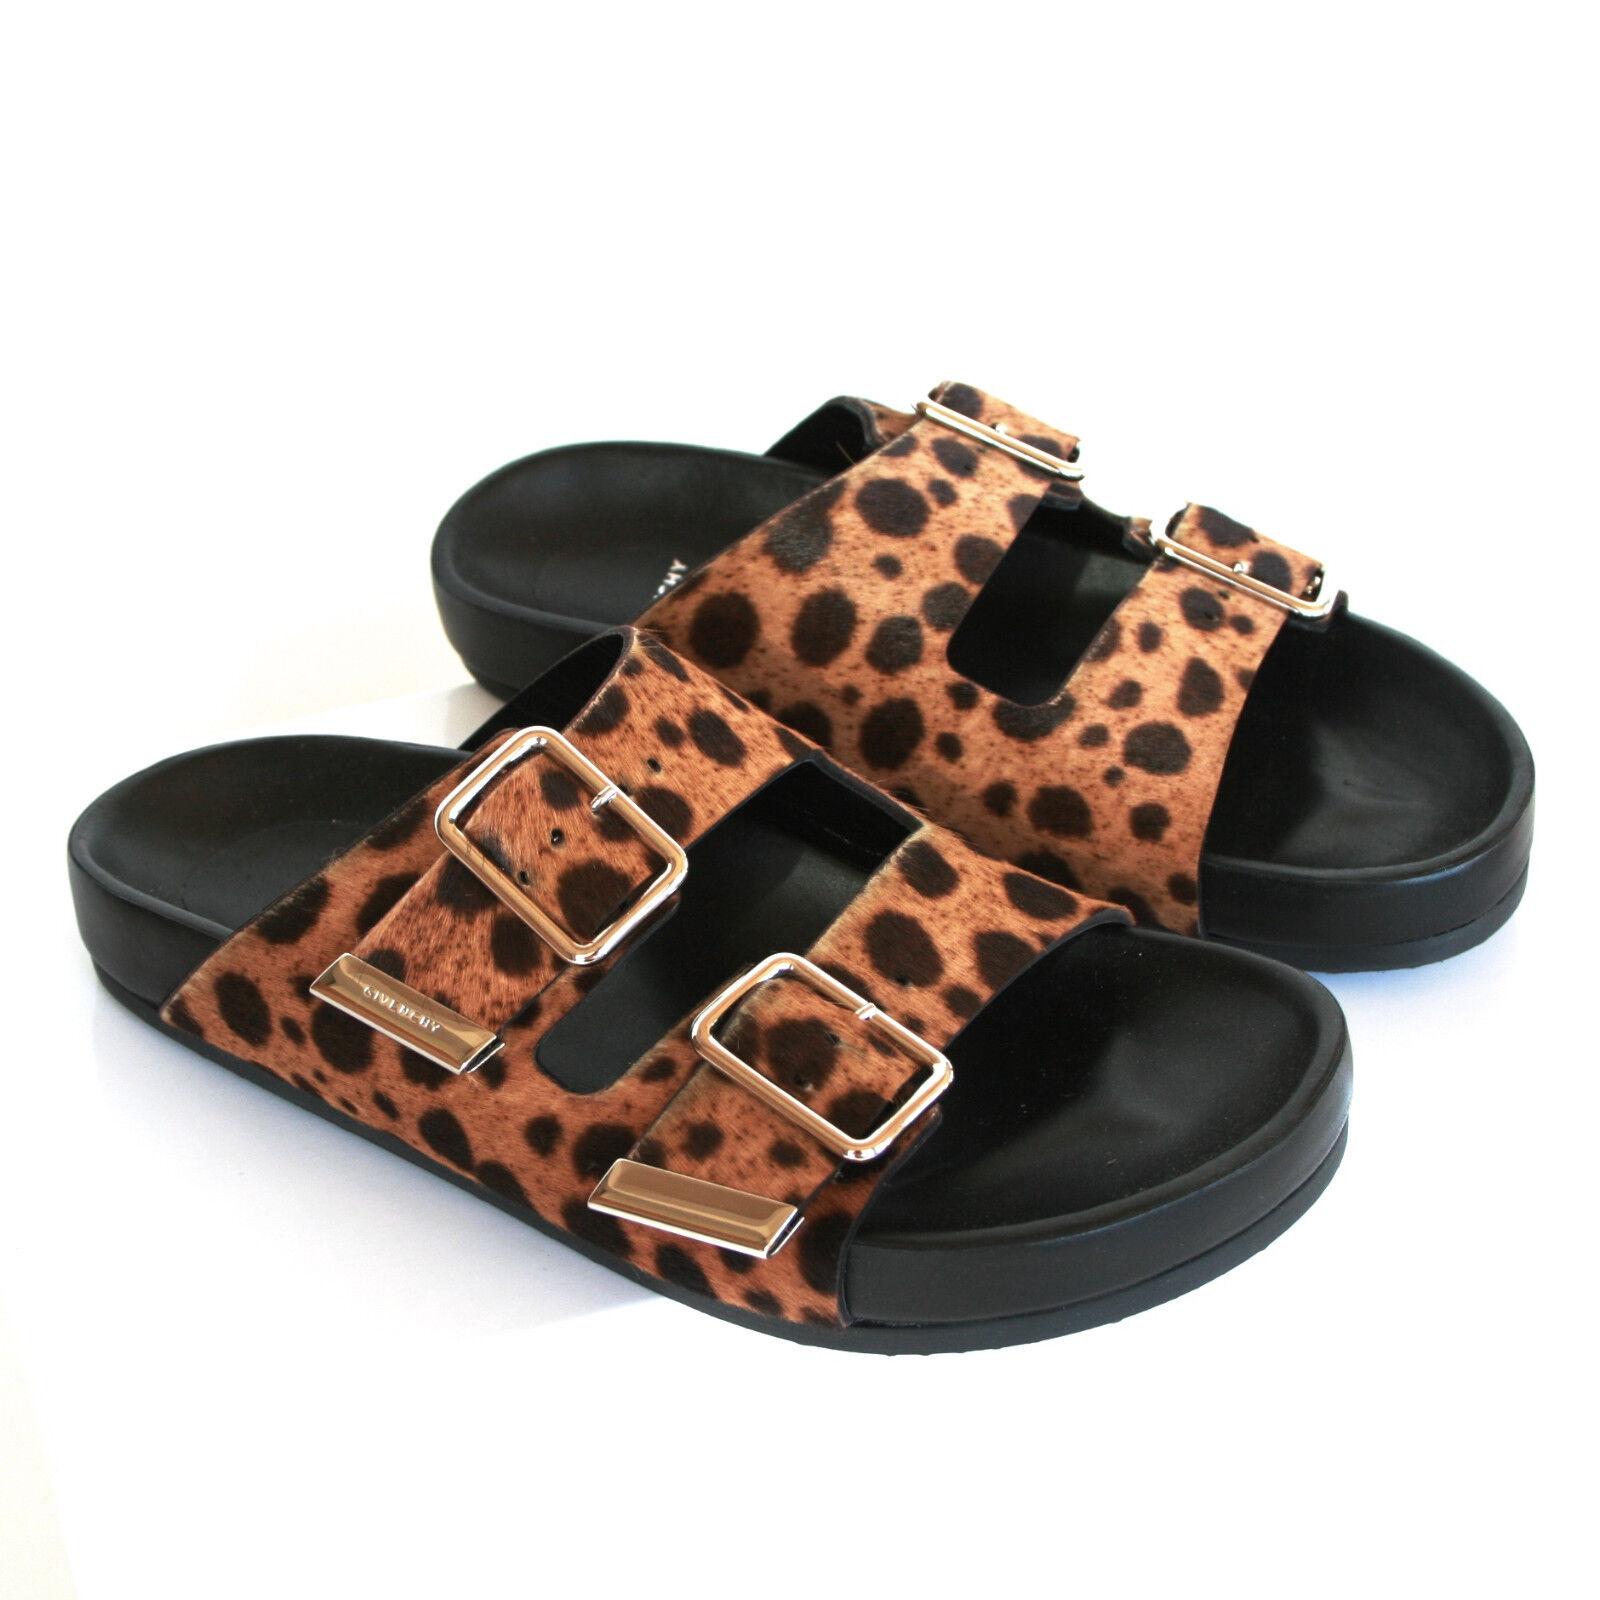 GIVENCHY  1,020 calf hair fur swiss leopard print Scarpe buckle sandals 35 NEW